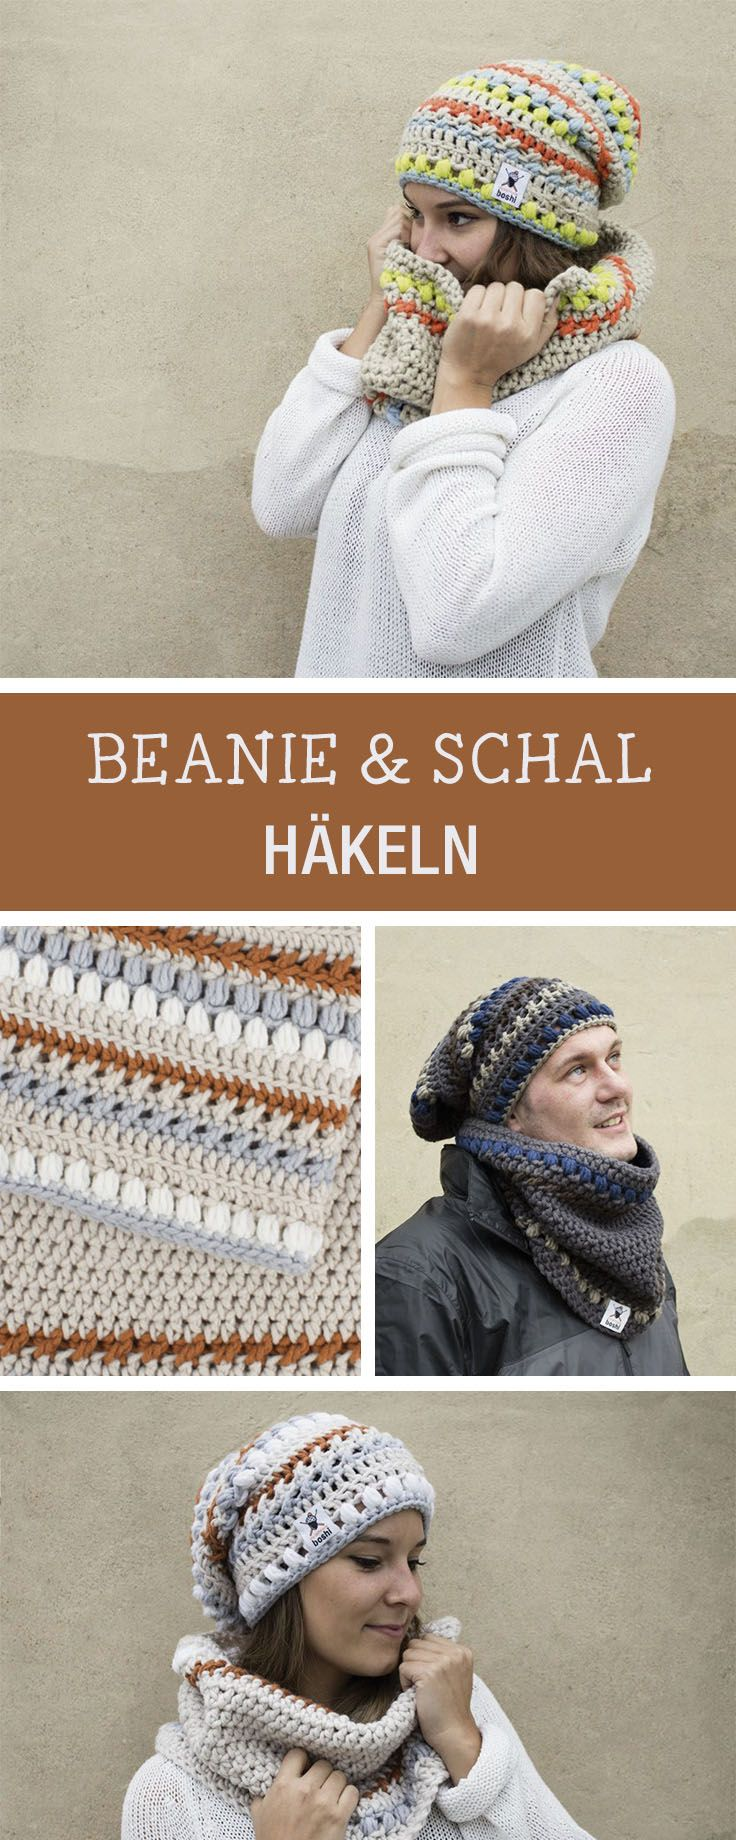 Häkeln - DIY-Anleitungen   Crochet, Crochet fashion and Diy clothing